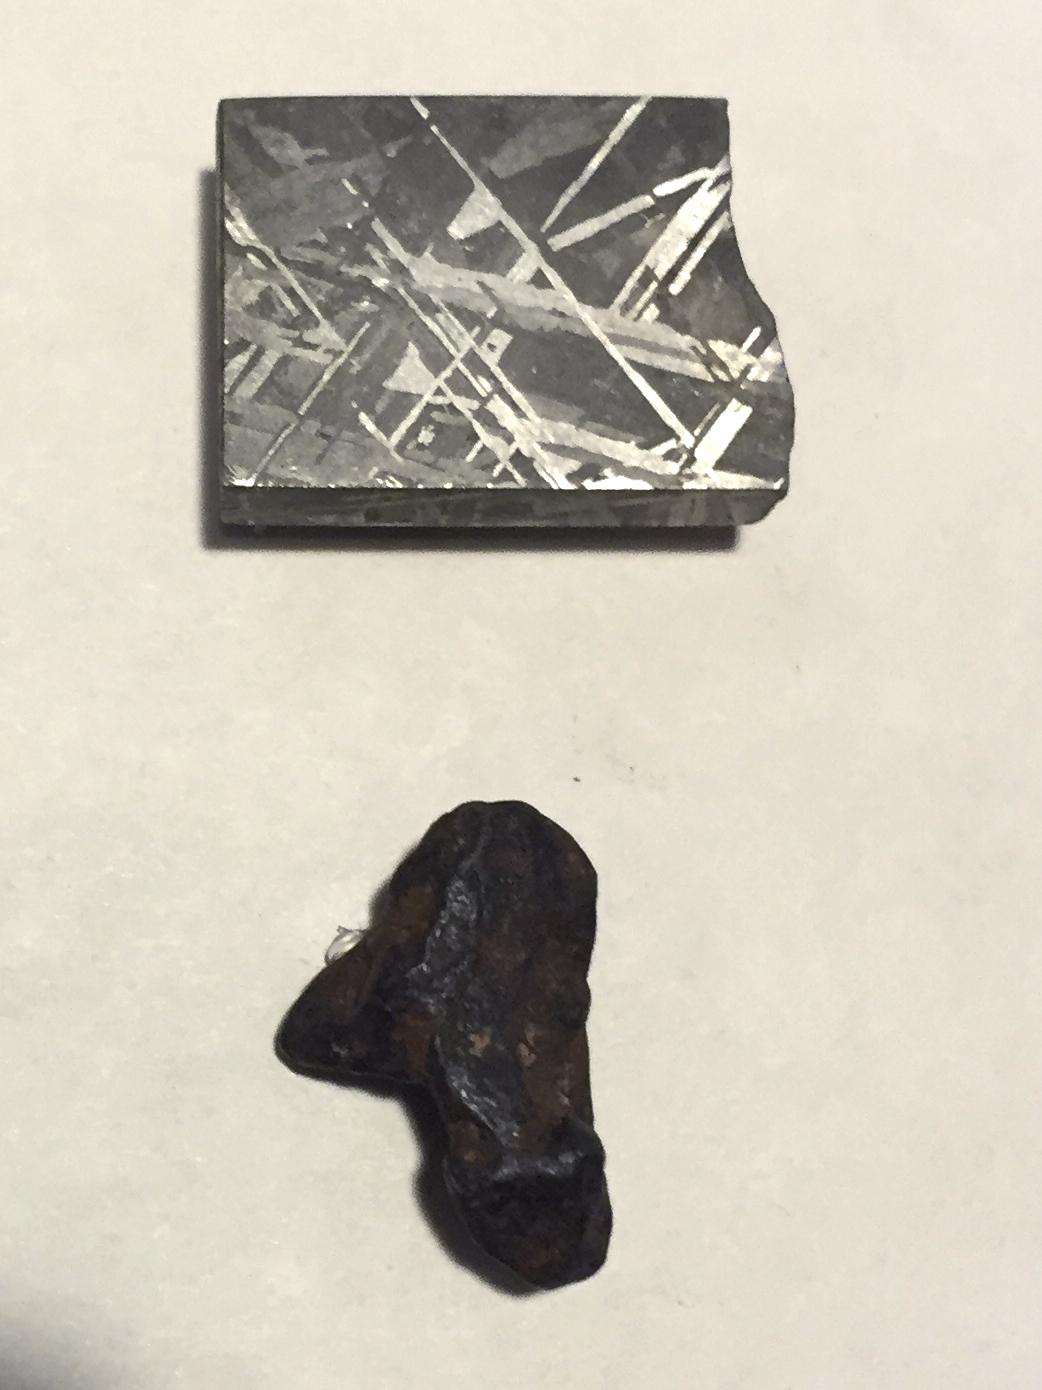 Iron meteorite - one cross-section cut